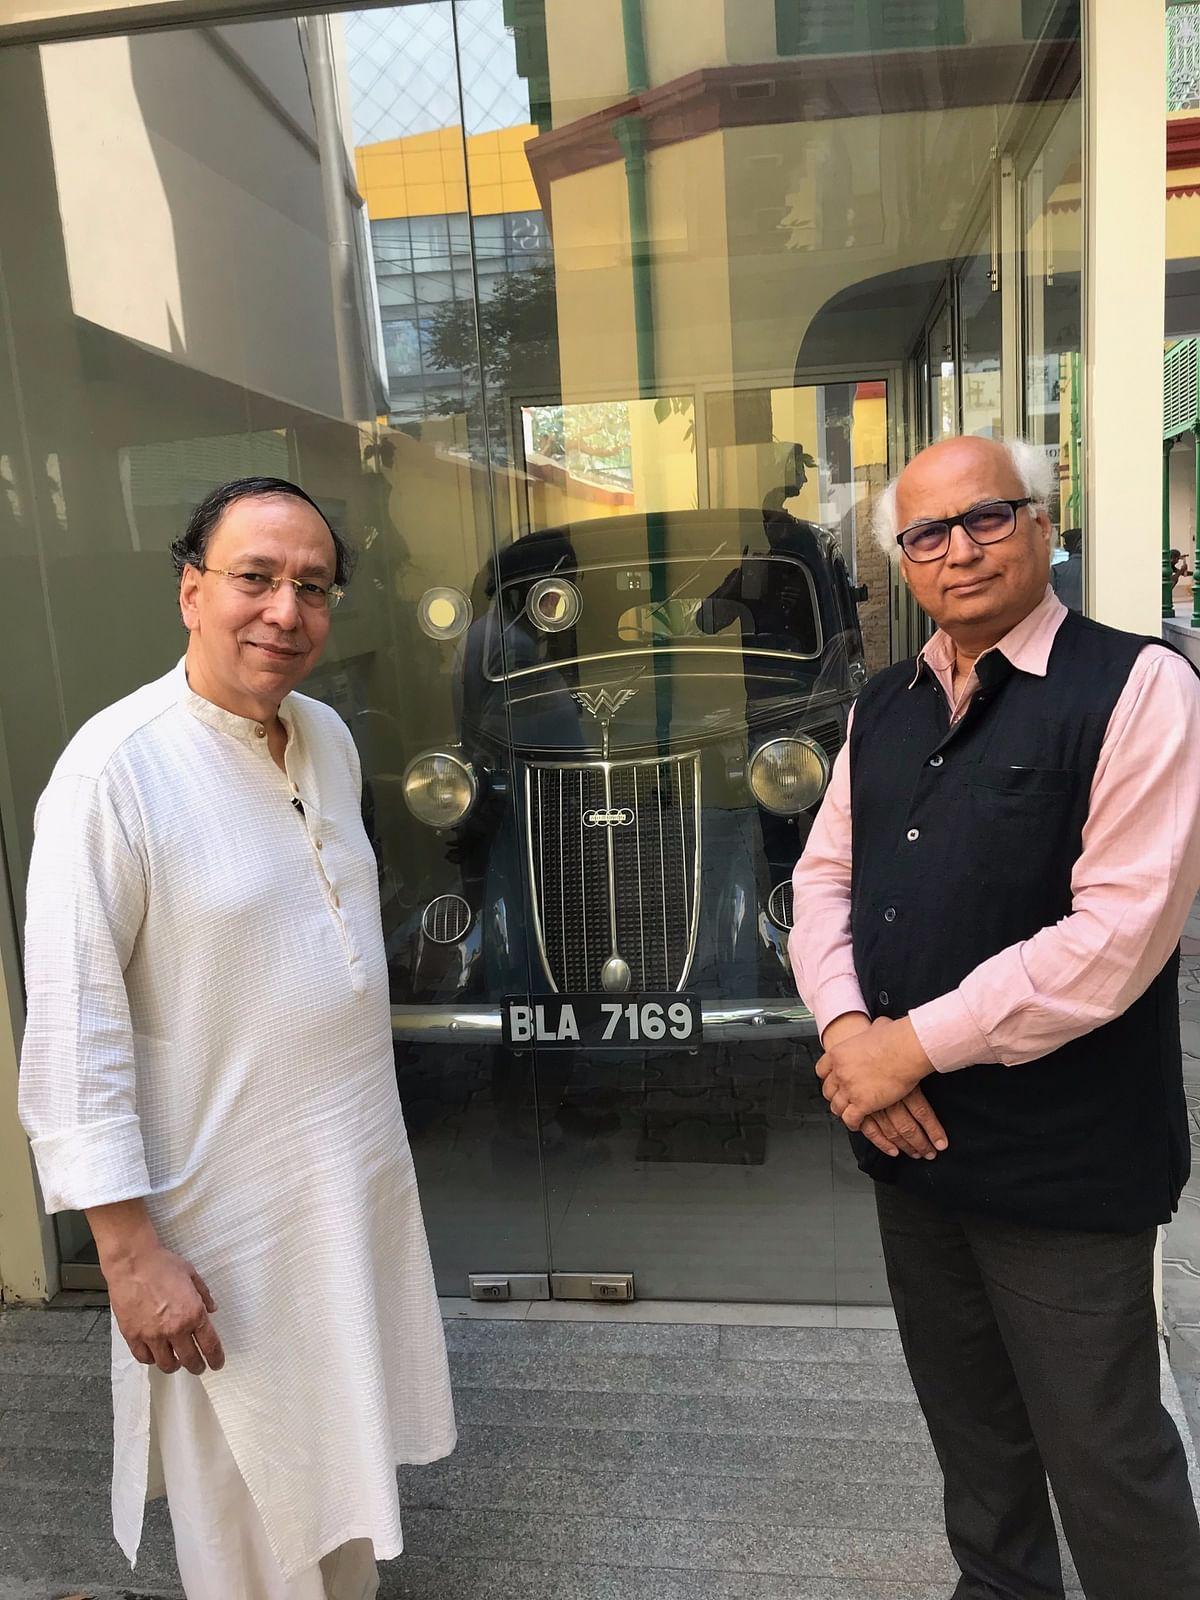 Author at Netaji Bose Museum in Kolkata last year at the invitation of Prof Sugata Bose, who is Netaji's grand nephew.